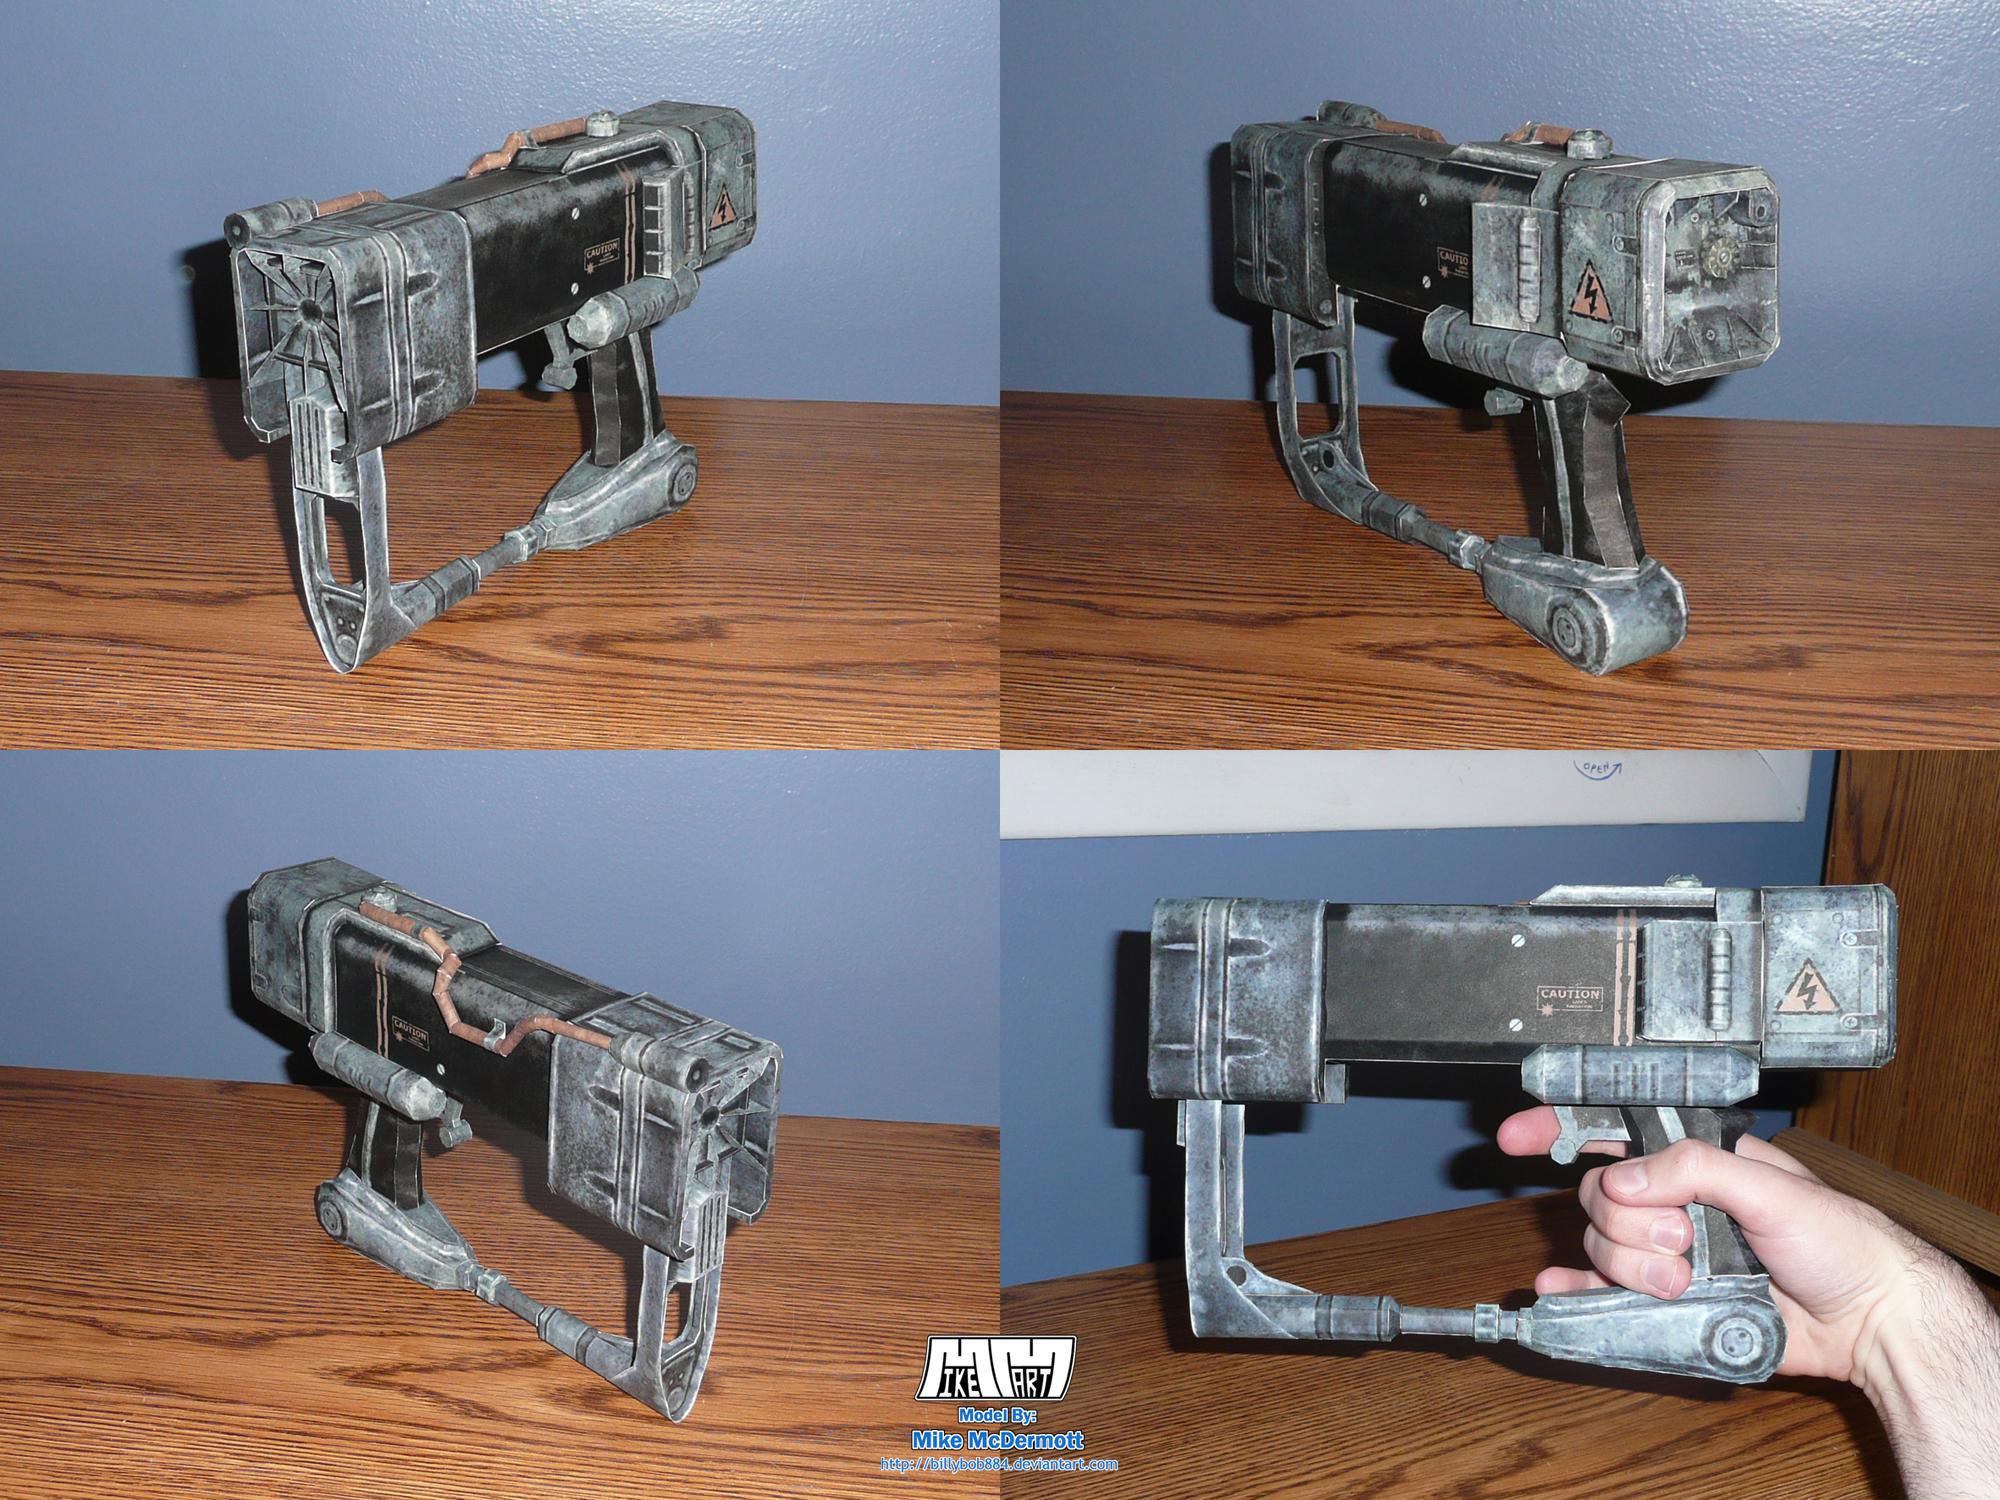 AEP7 Laser Pistol Assembled